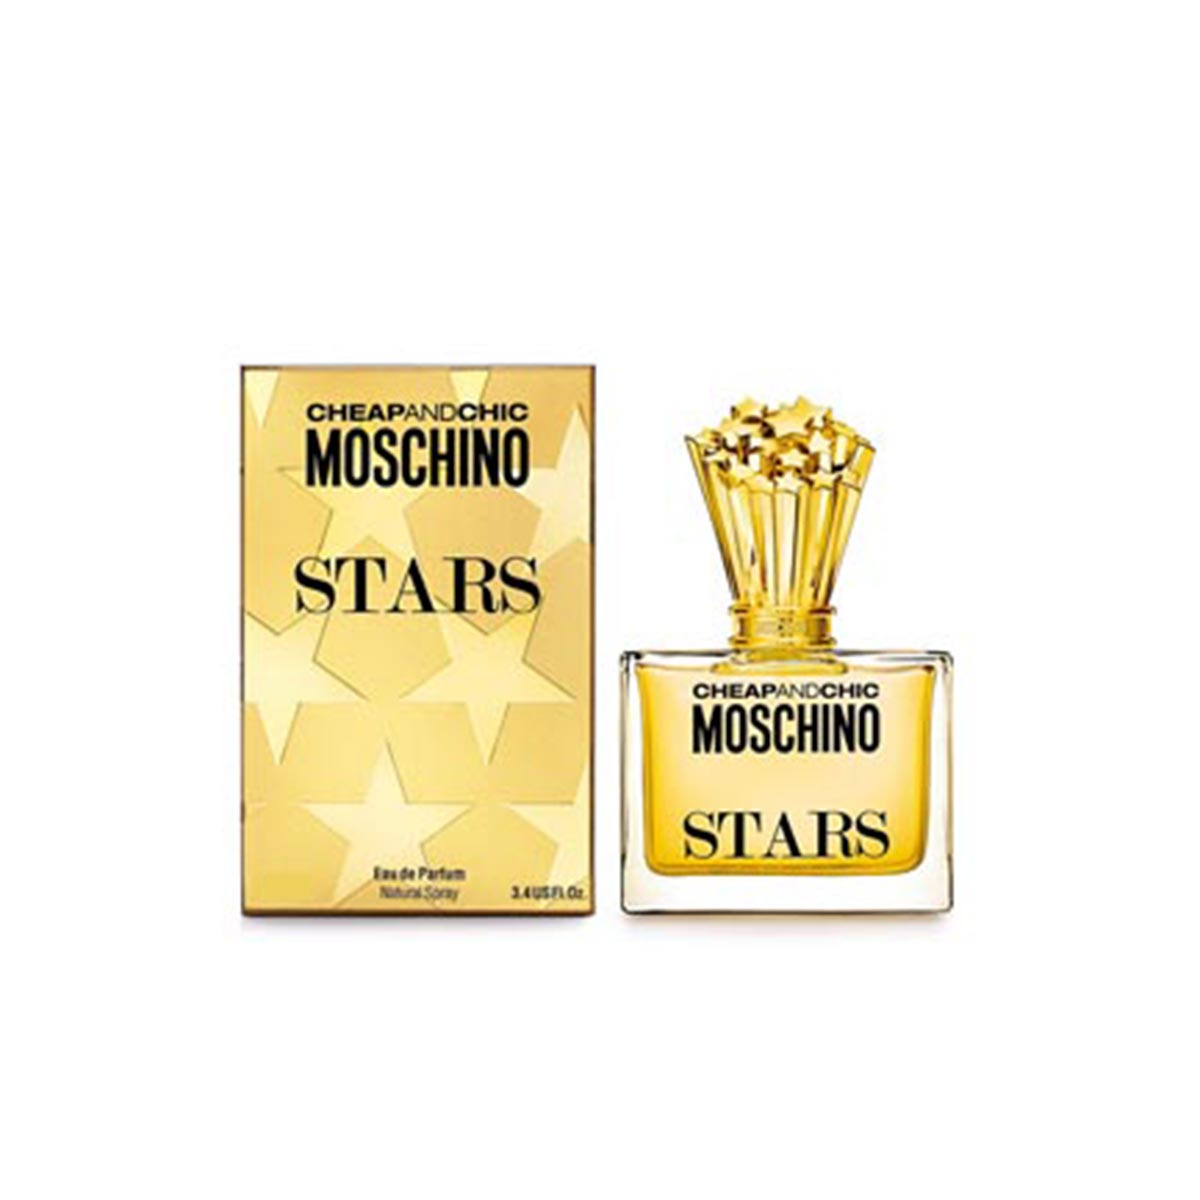 Moschino cheapandchic stars eau de parfum 30ml vaporizador